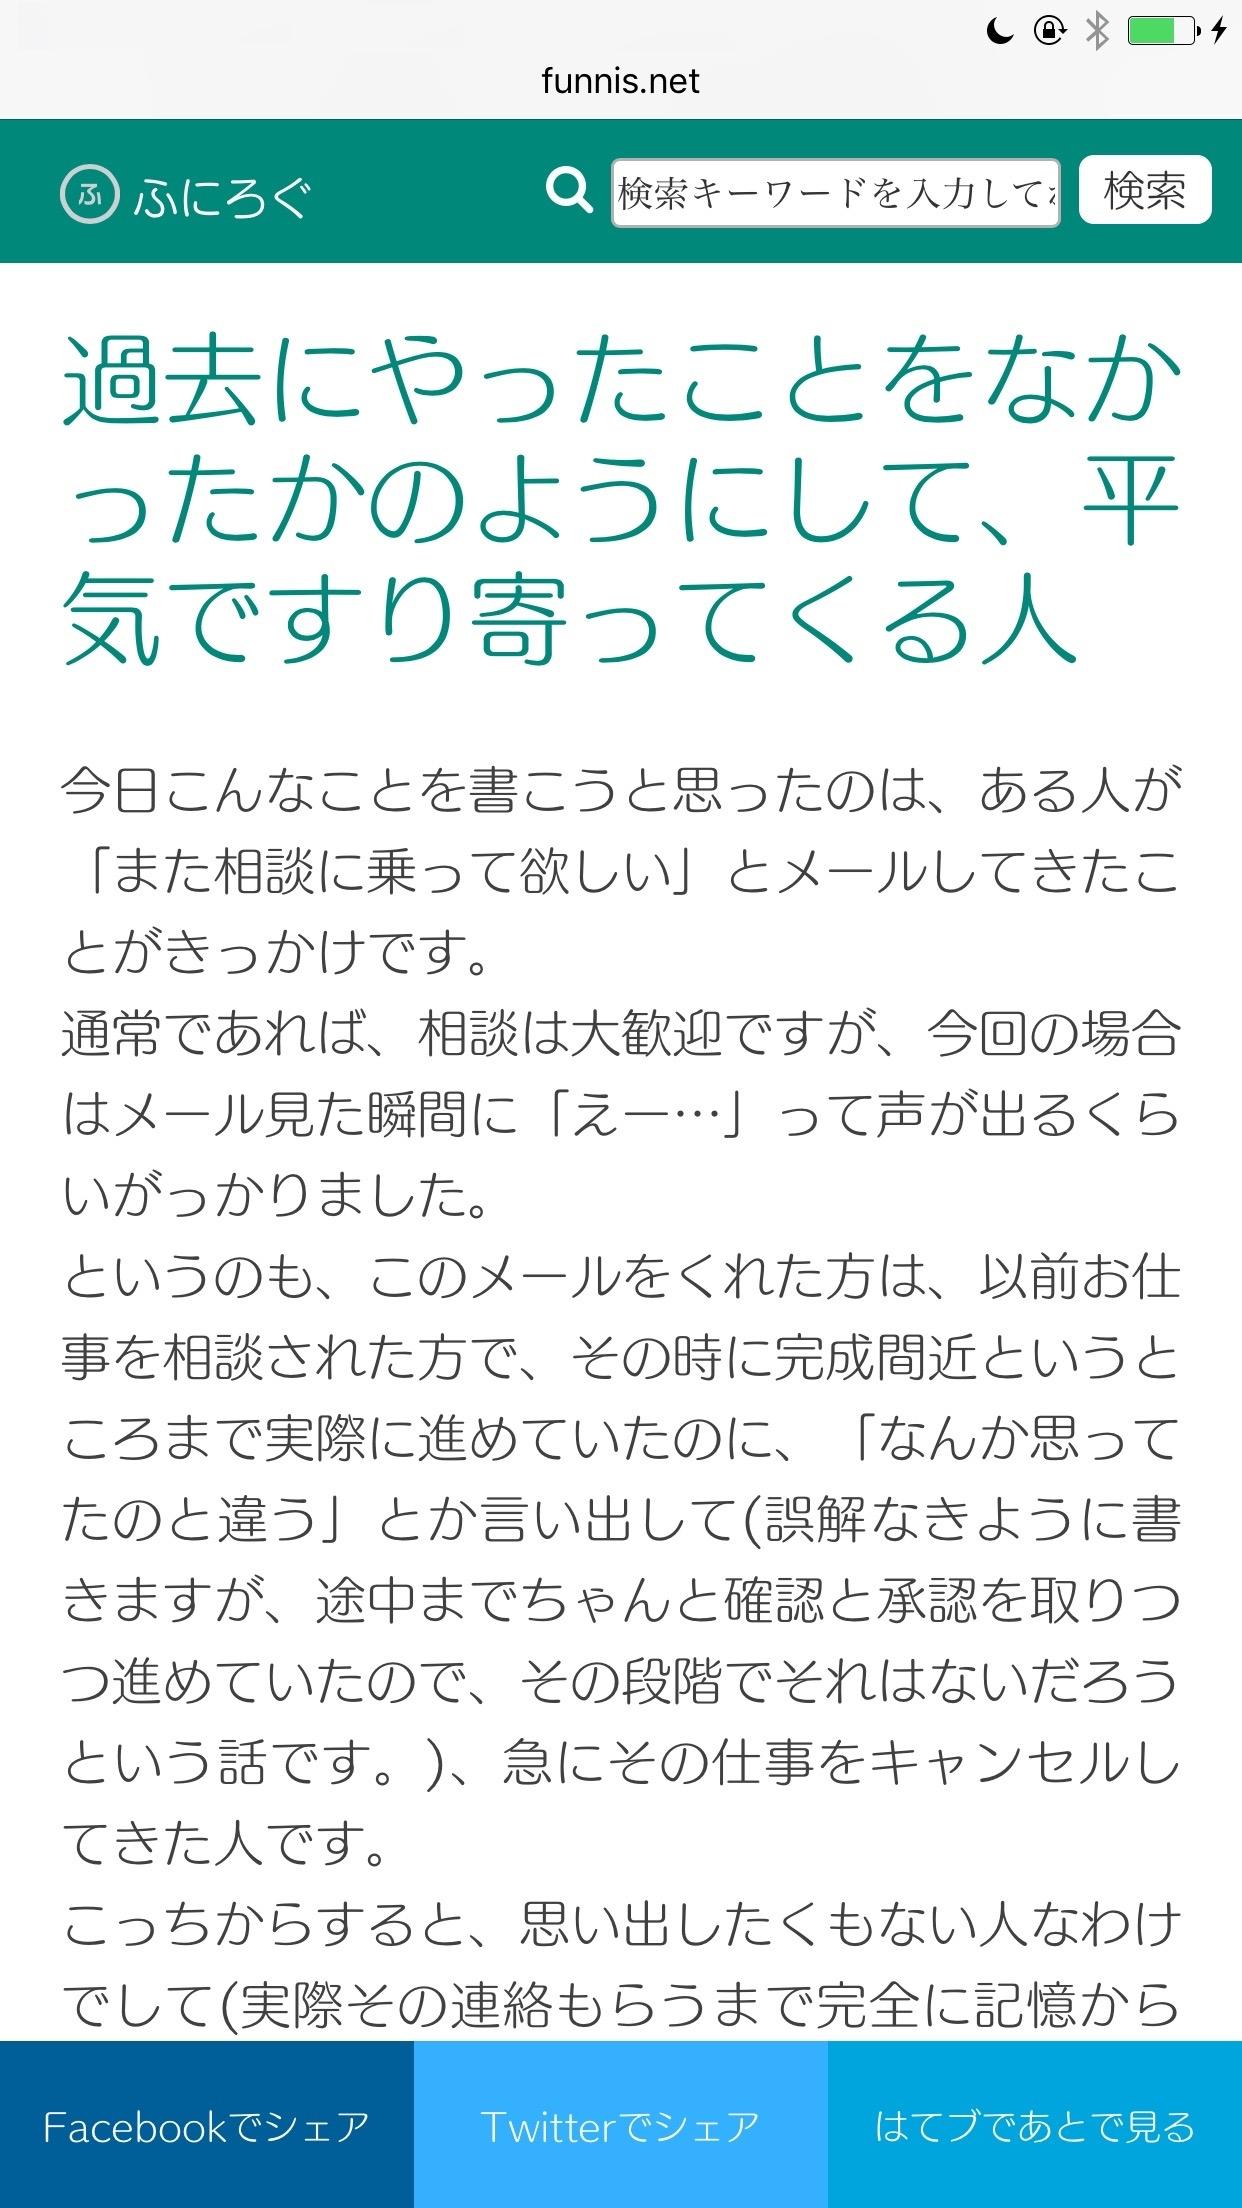 https://news.mynavi.jp/itsearch/2017/05/09/blog02.jpg